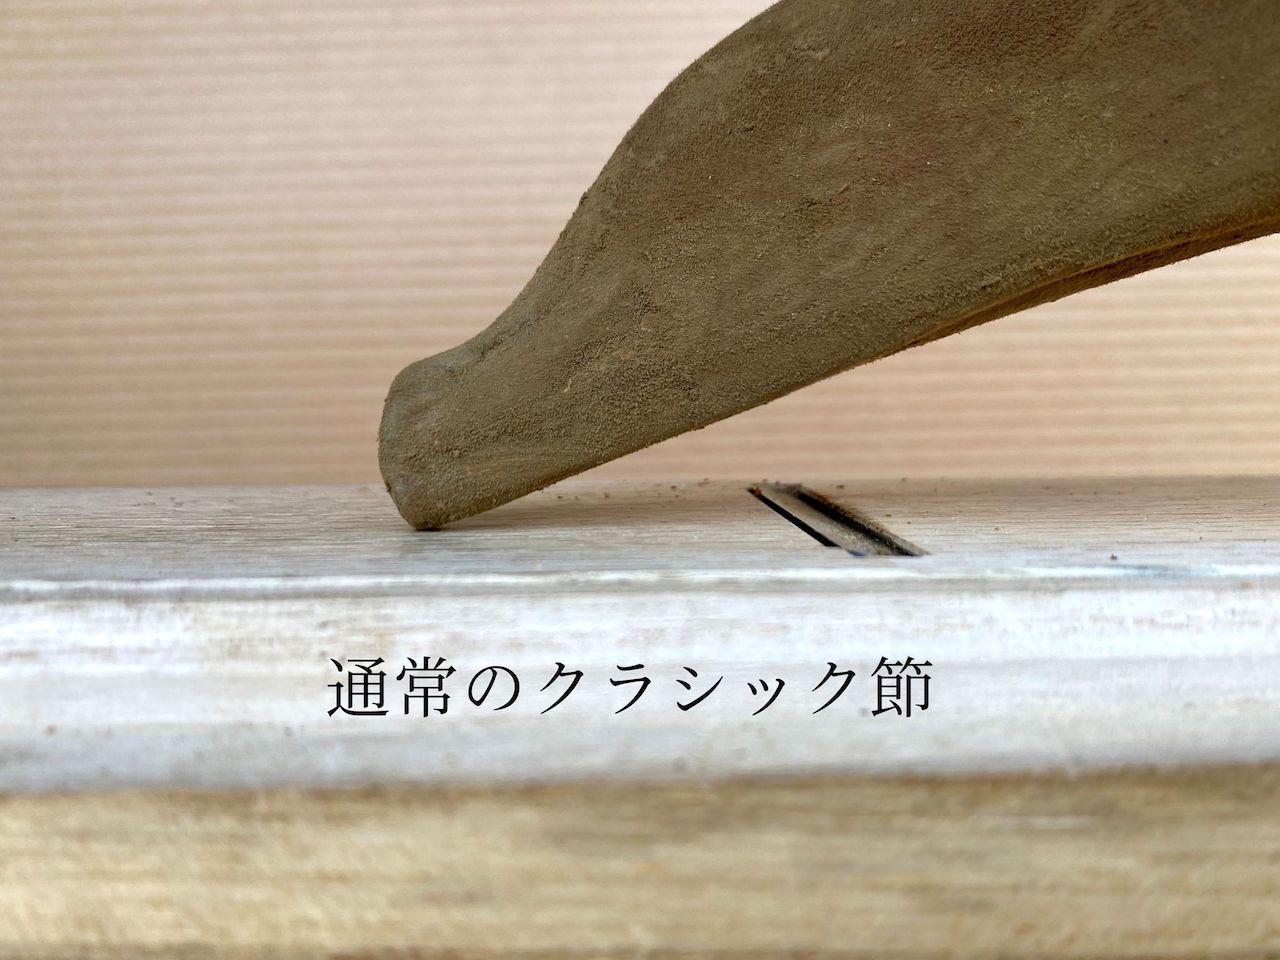 《New》 本枯節CLASSIC-BUSHI  【斬】 ー 男節 1本 ー 【遠洋一本釣り鰹使用】